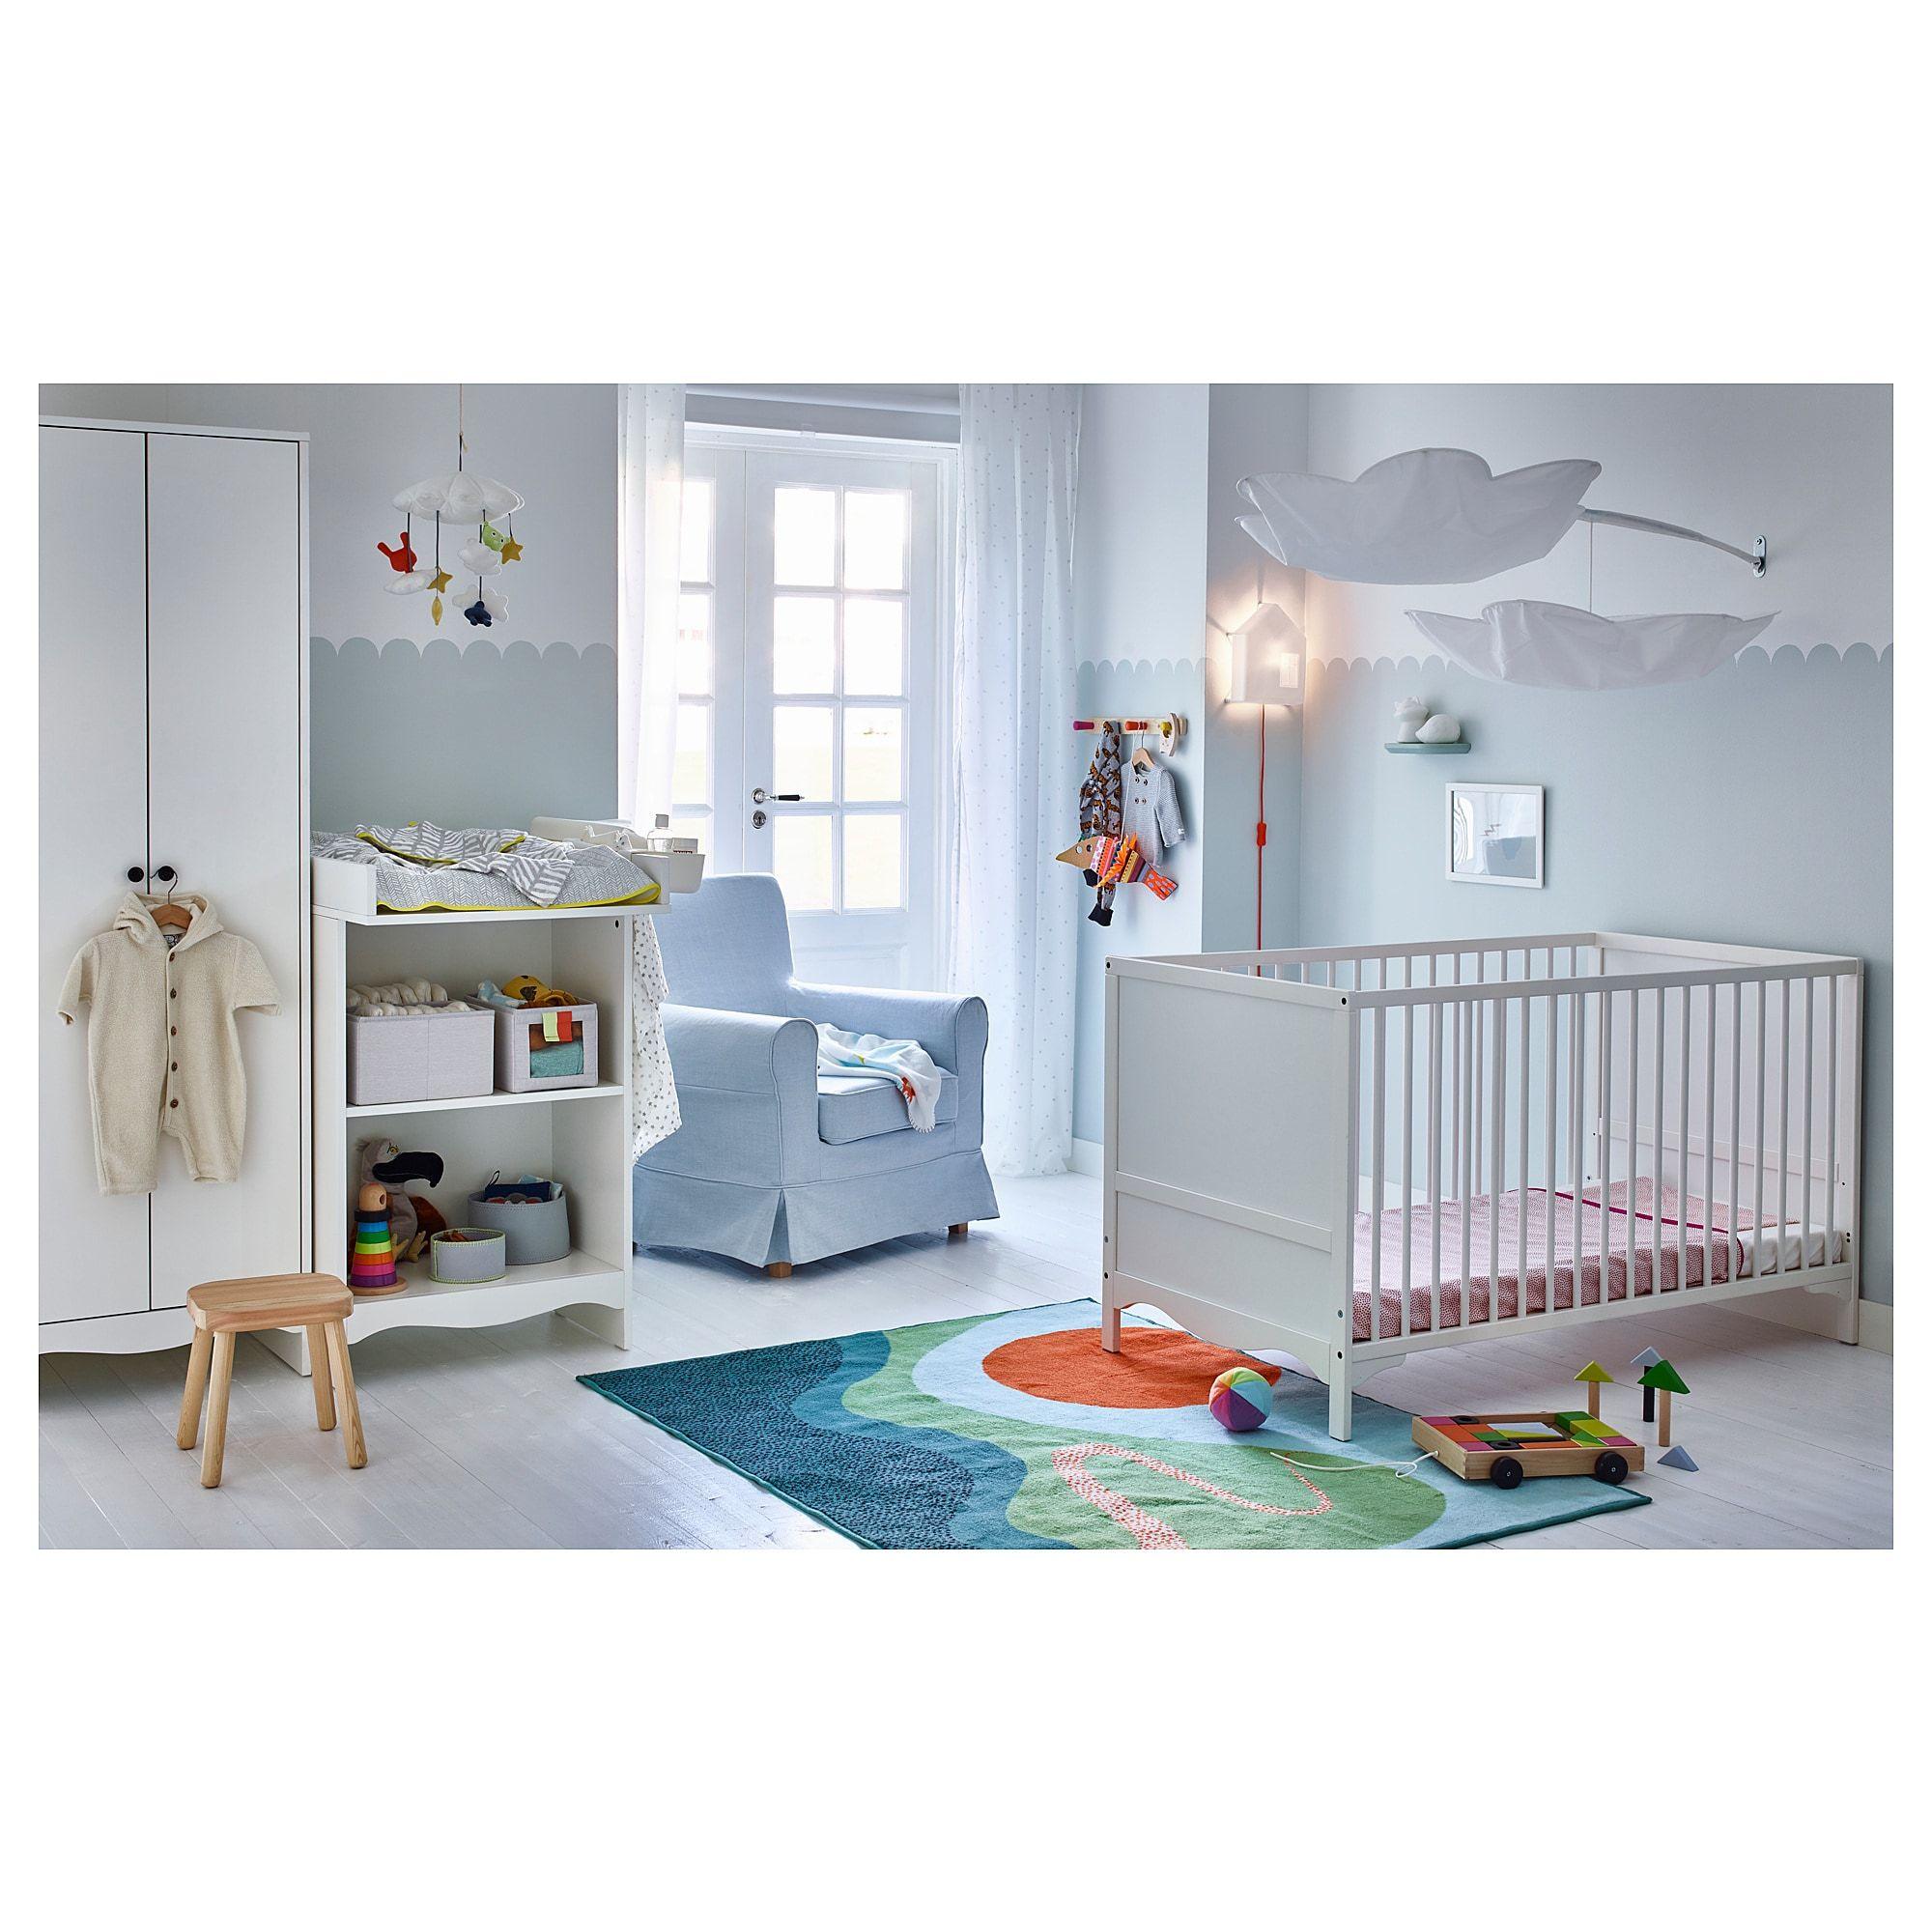 IKEA SOLGUL Crib white Ikea baby, Baby boy rooms, Cribs